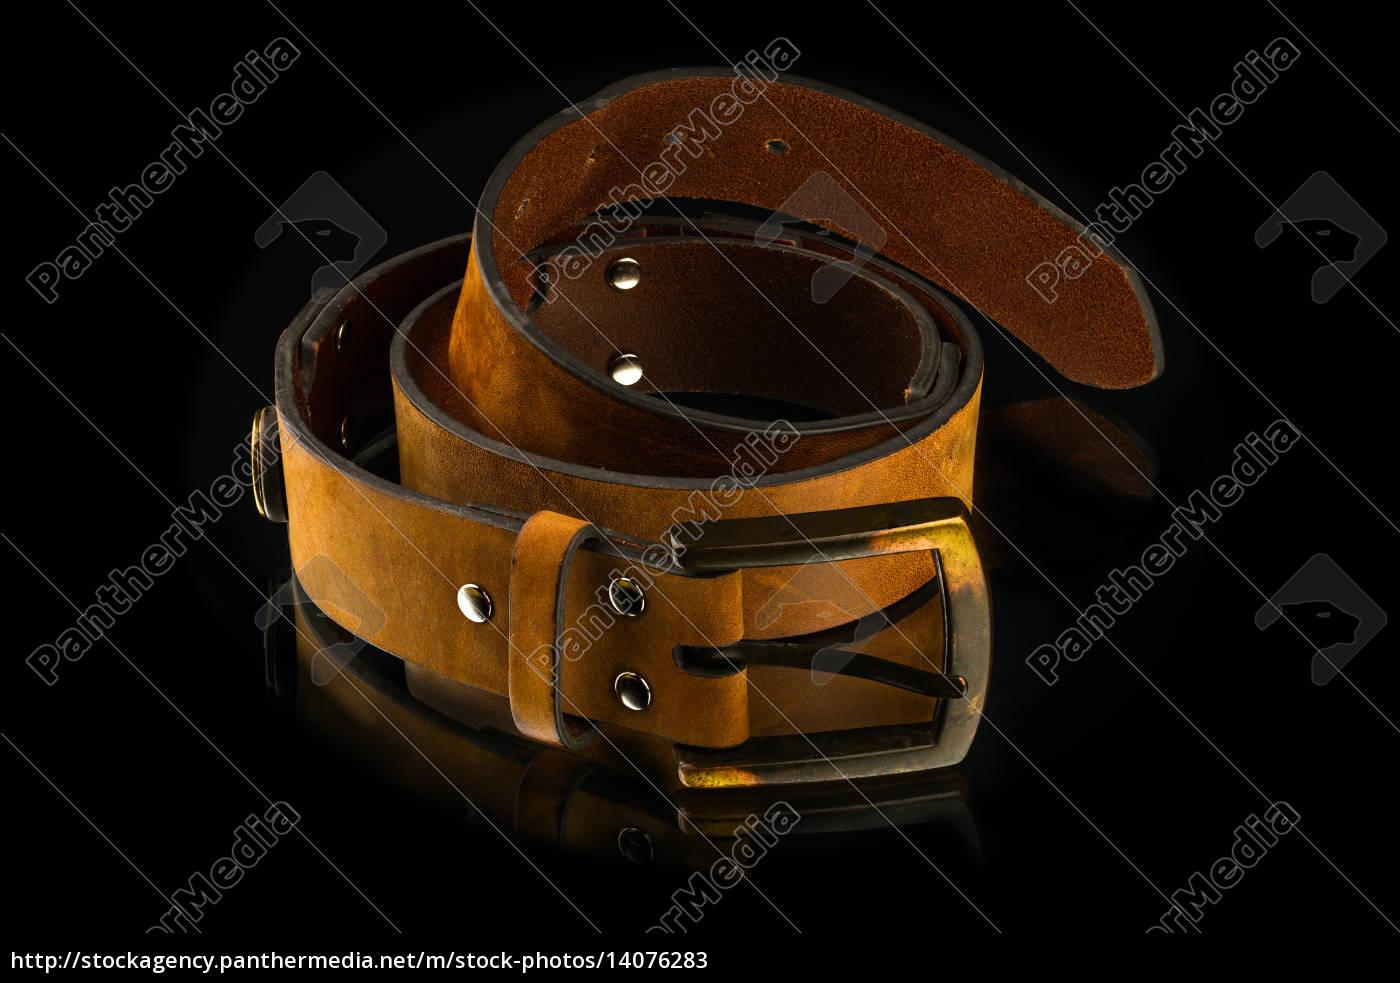 new, stylish, brown, leather, men's, belt - 14076283